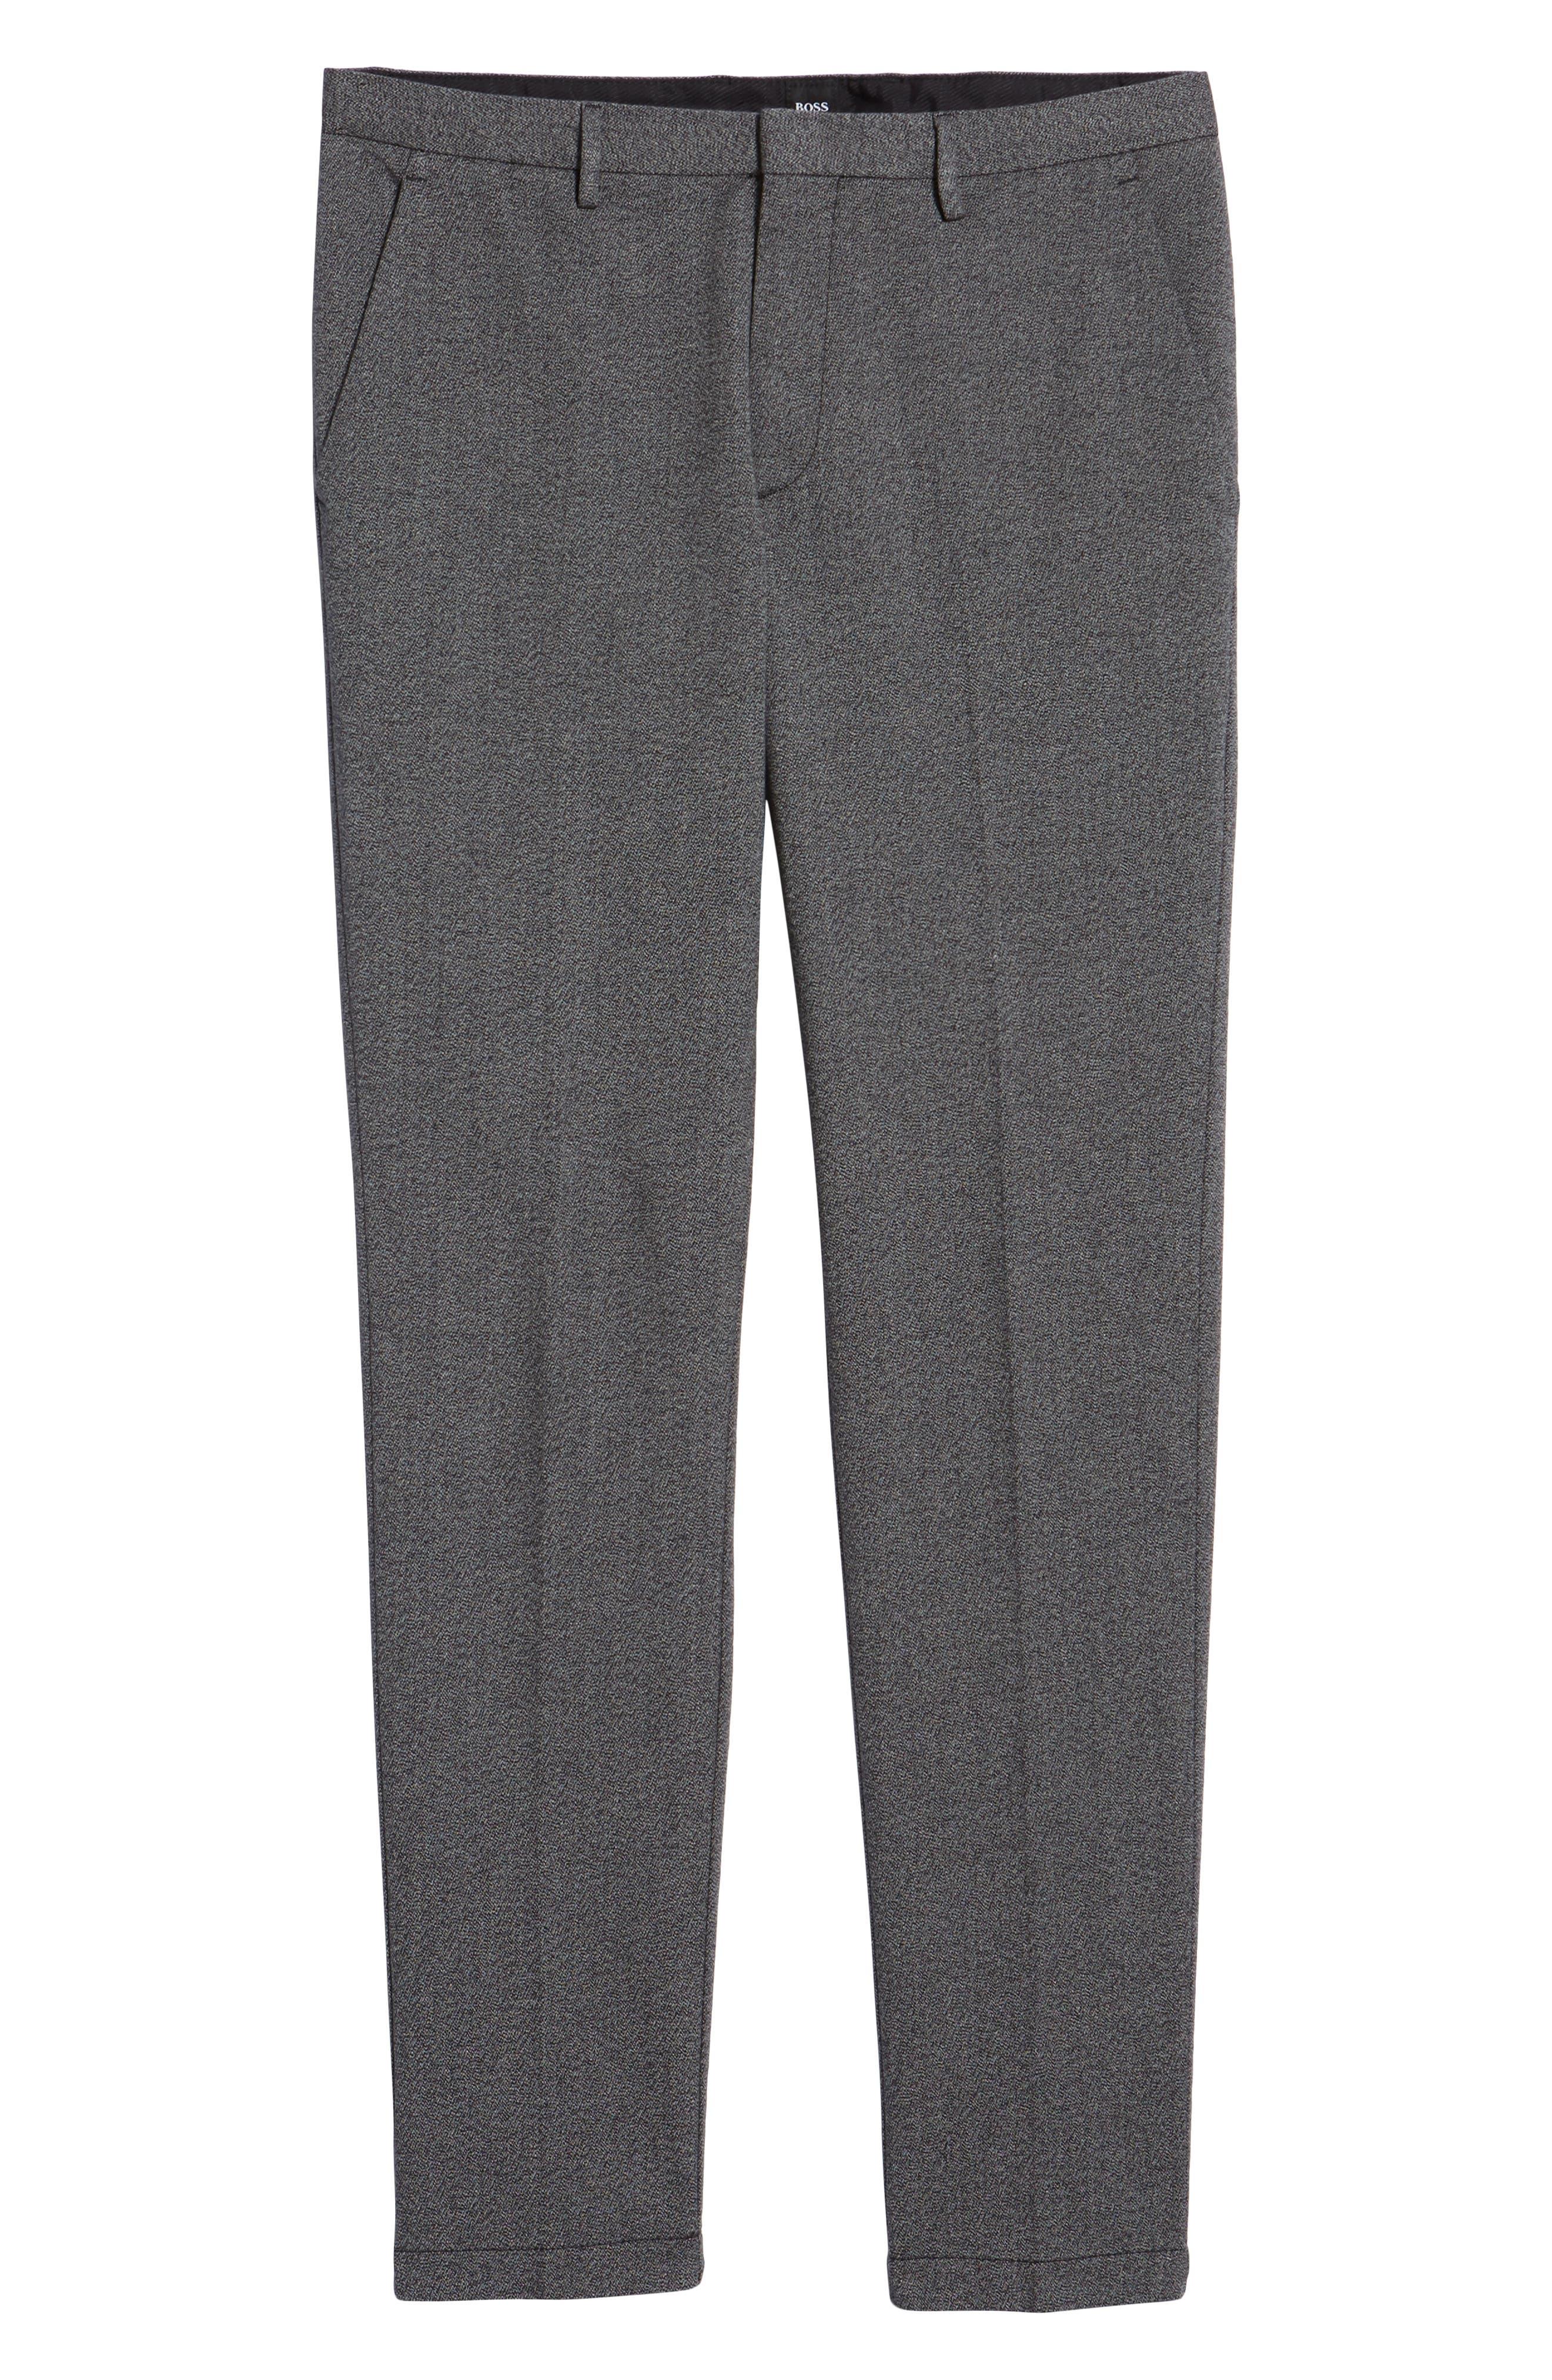 Kaito Slim Fit Twill Trousers,                             Alternate thumbnail 6, color,                             BLACK